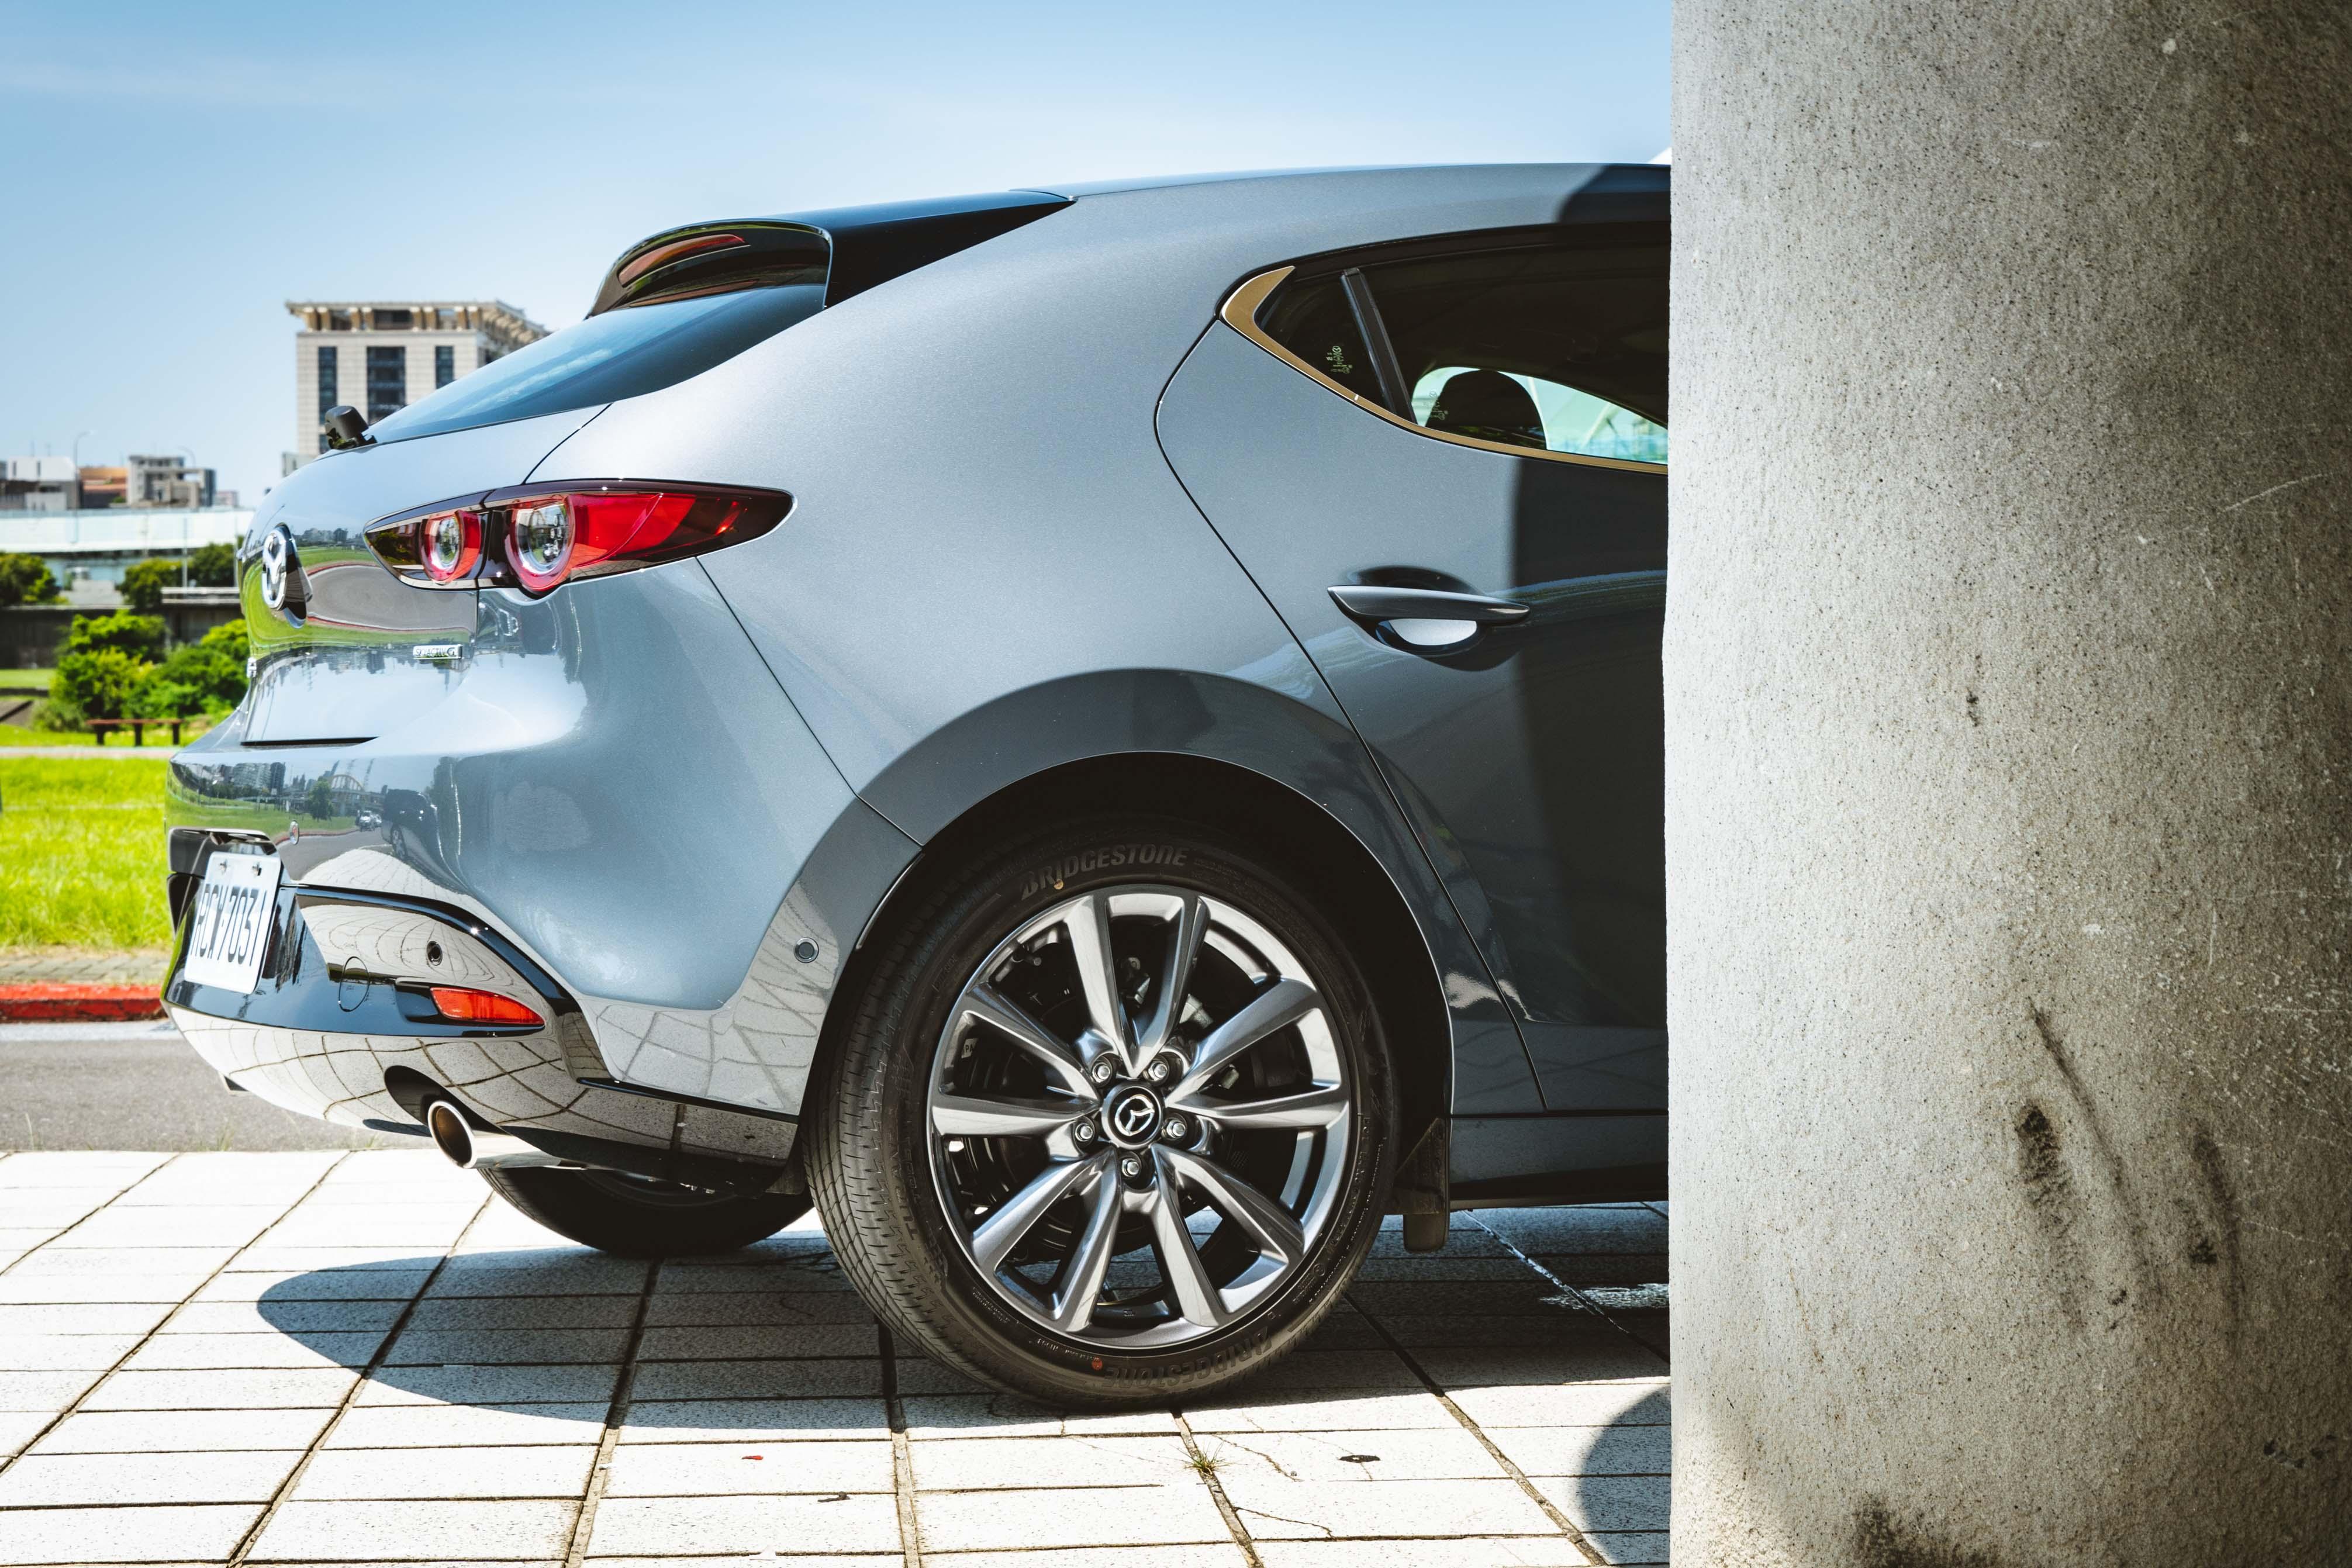 21 年式 Mazda3 維持原本外觀配備。